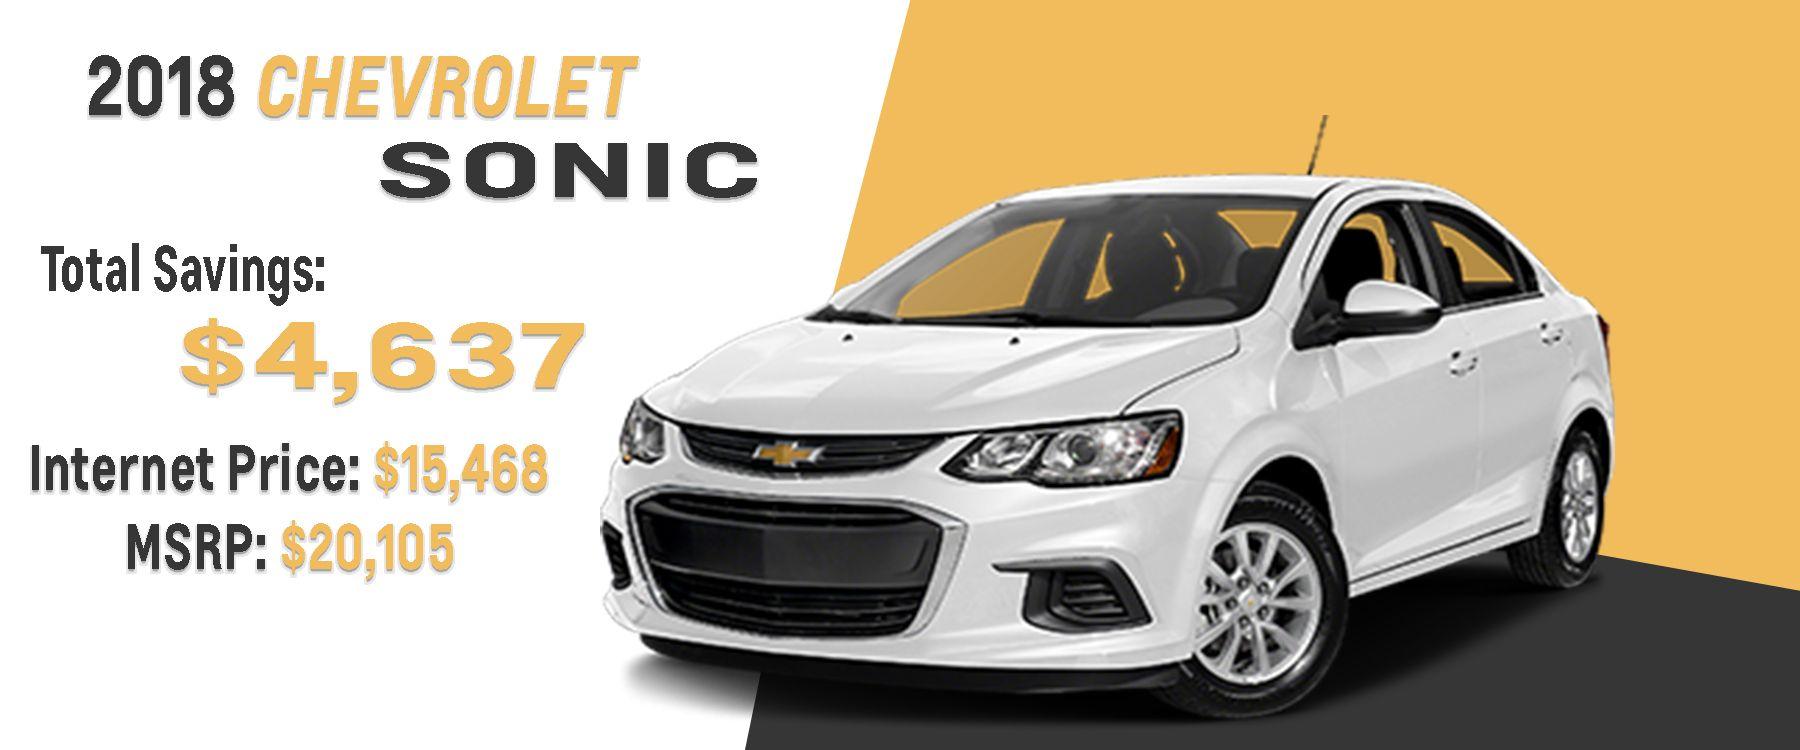 New Chevrolet Sonic in Homewood | Chevy Sonic | Chevrolet